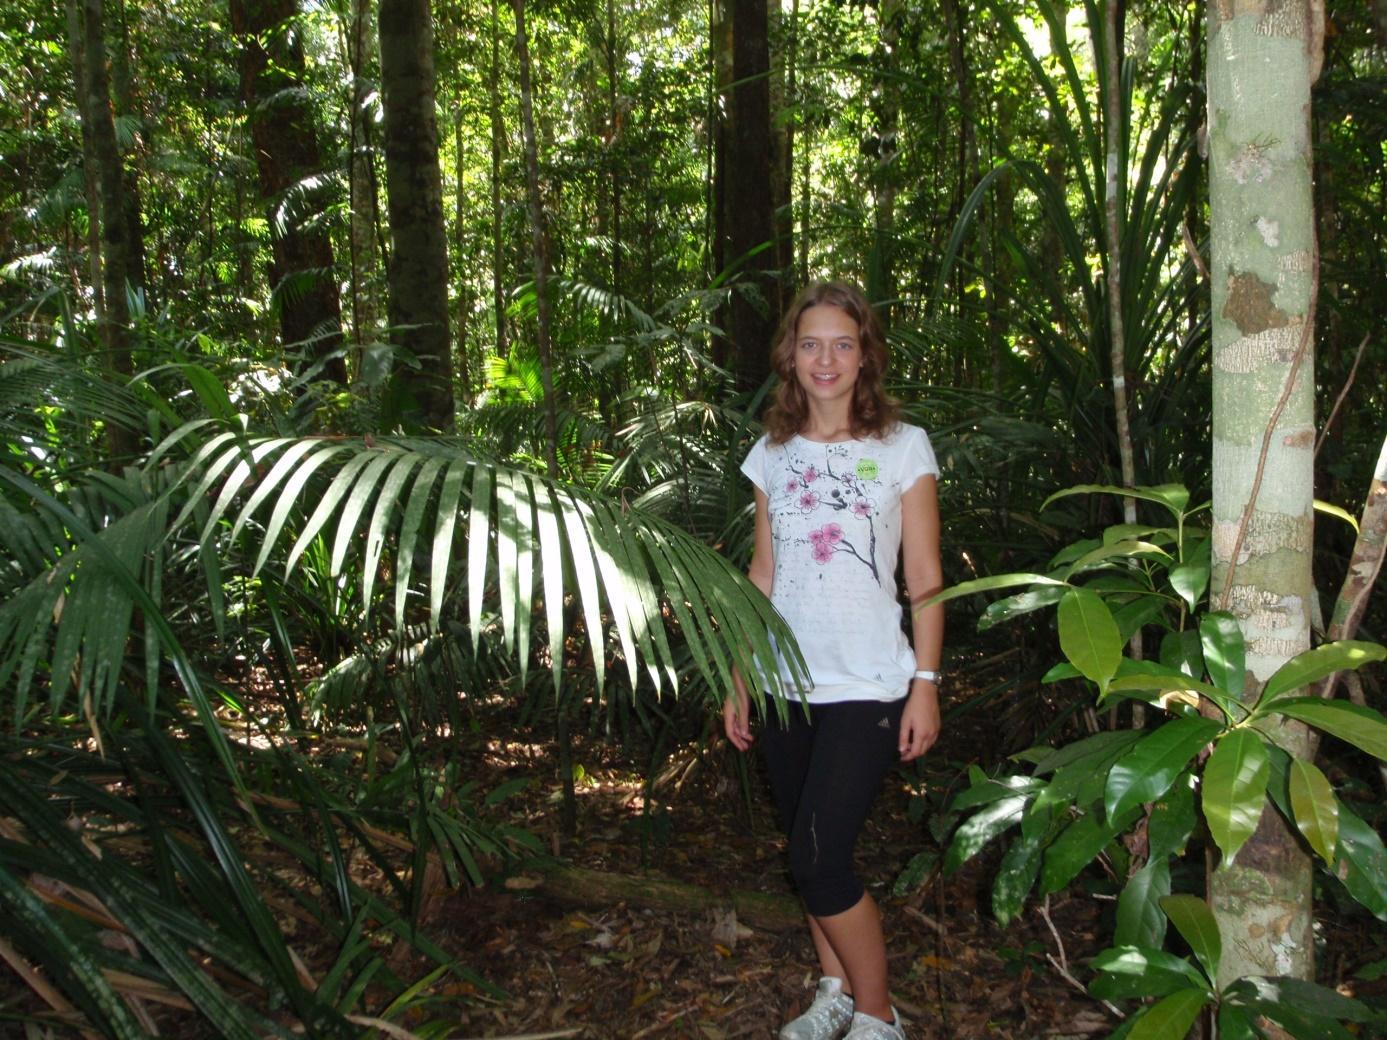 D:\SLIKE\PUTOVANJA\Australija + NZ + Singapore 2009-2010\Zoran\PC241713.JPG